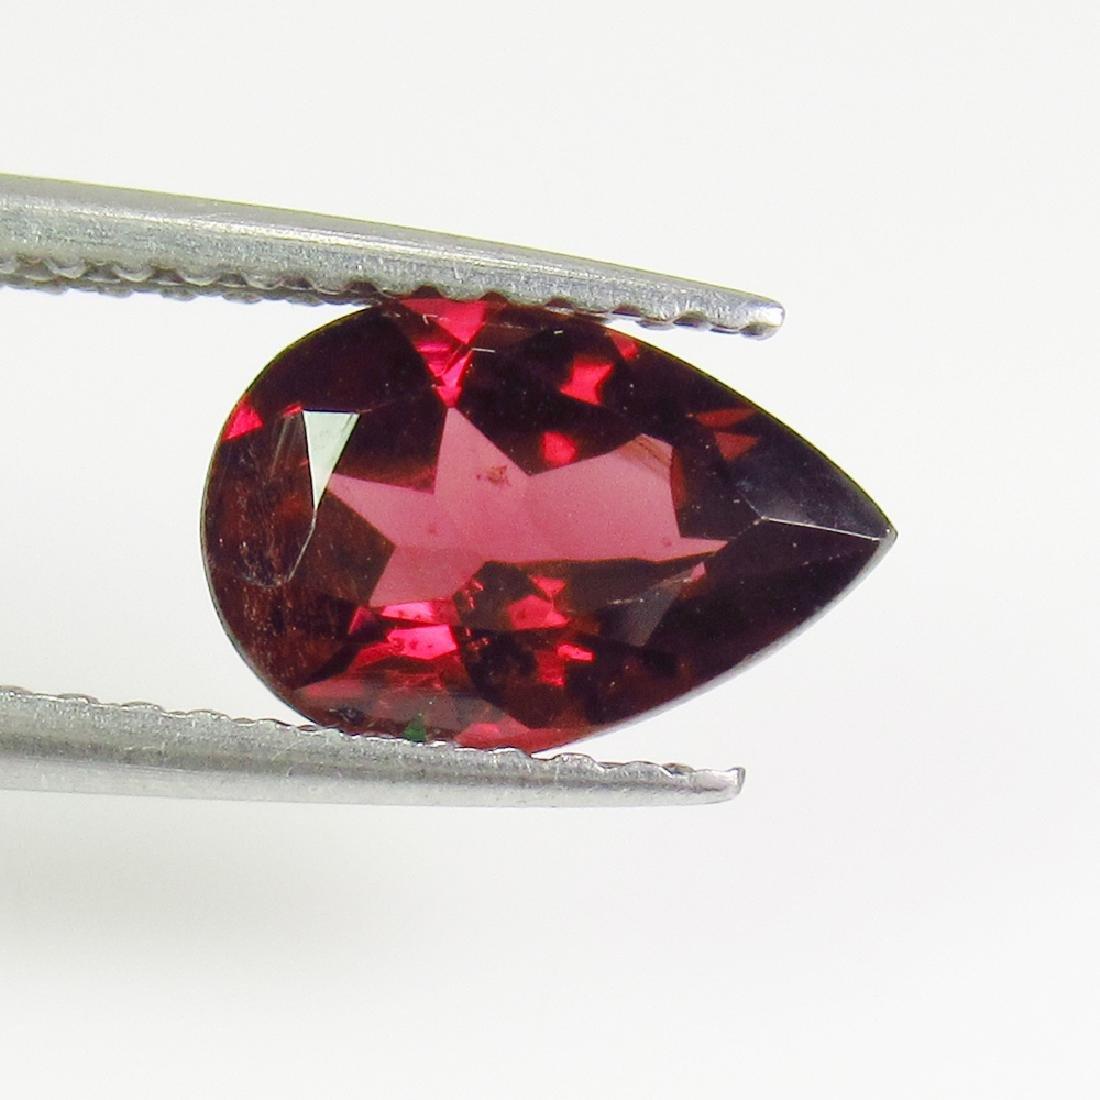 1.58 Ctw Natural Pink Rhodolite Garnet 9X6 mm Pear Cut